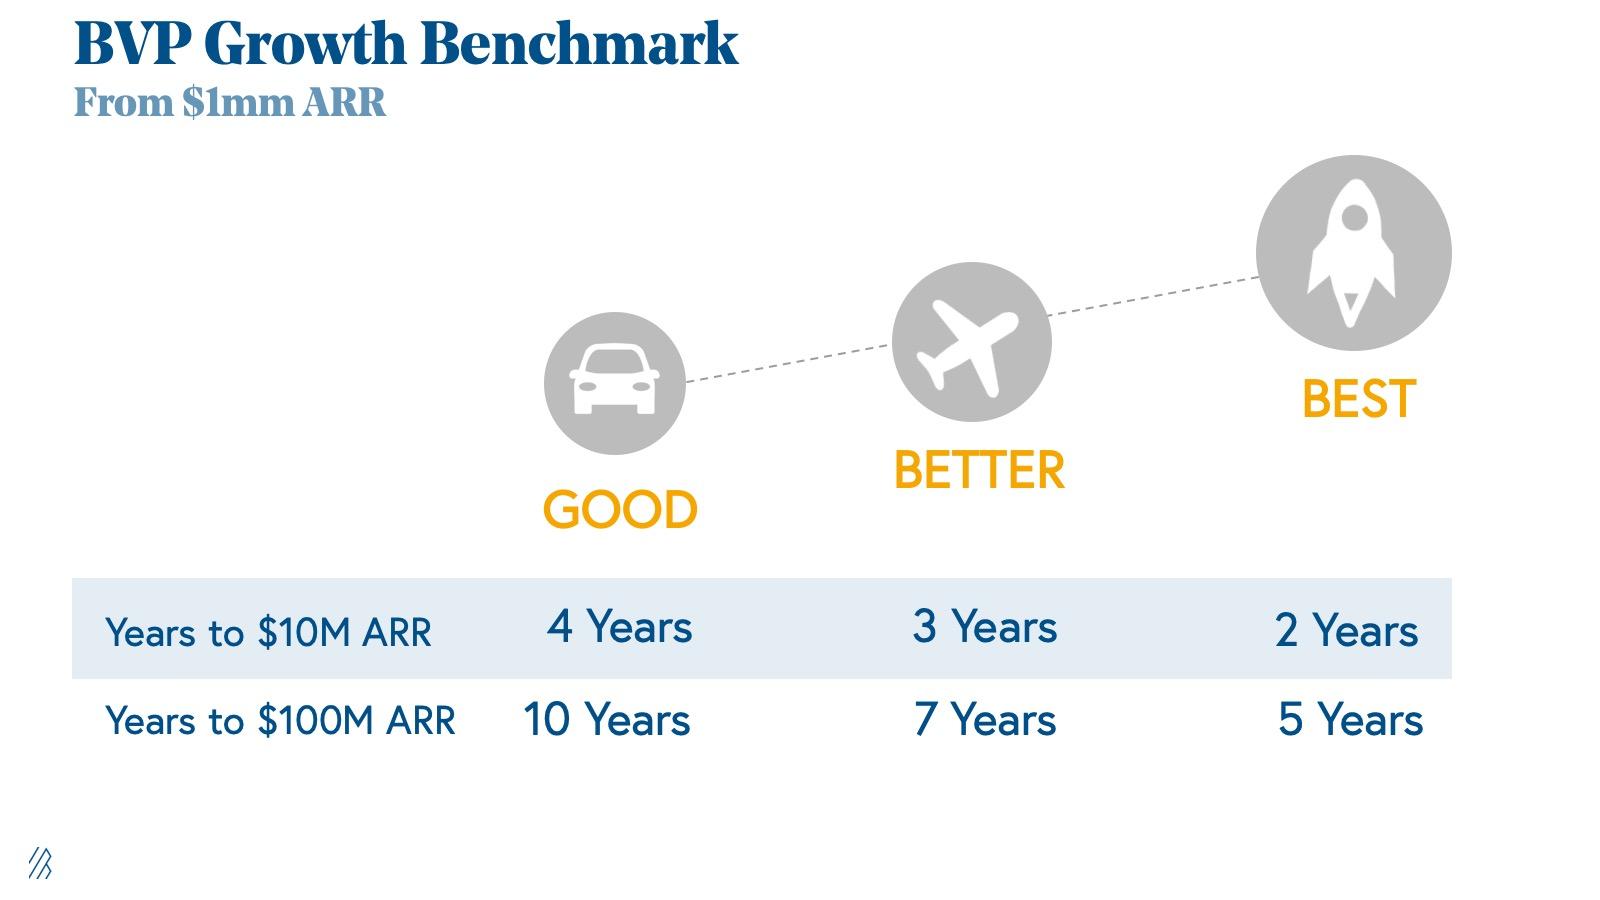 BVP Growth Benchmark